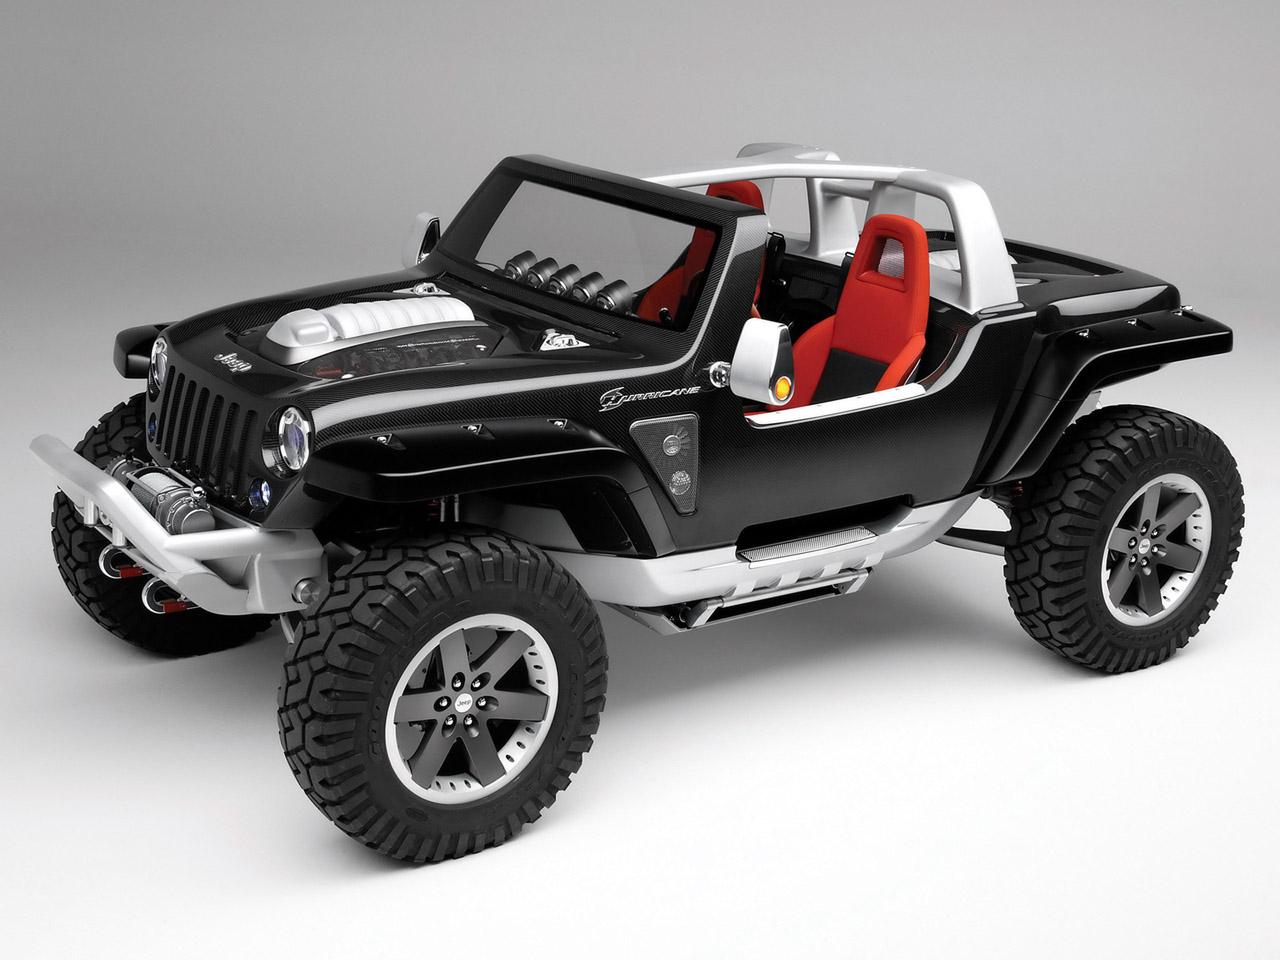 2005-jeep-hurricane-concept-sa-1280x960.jpg